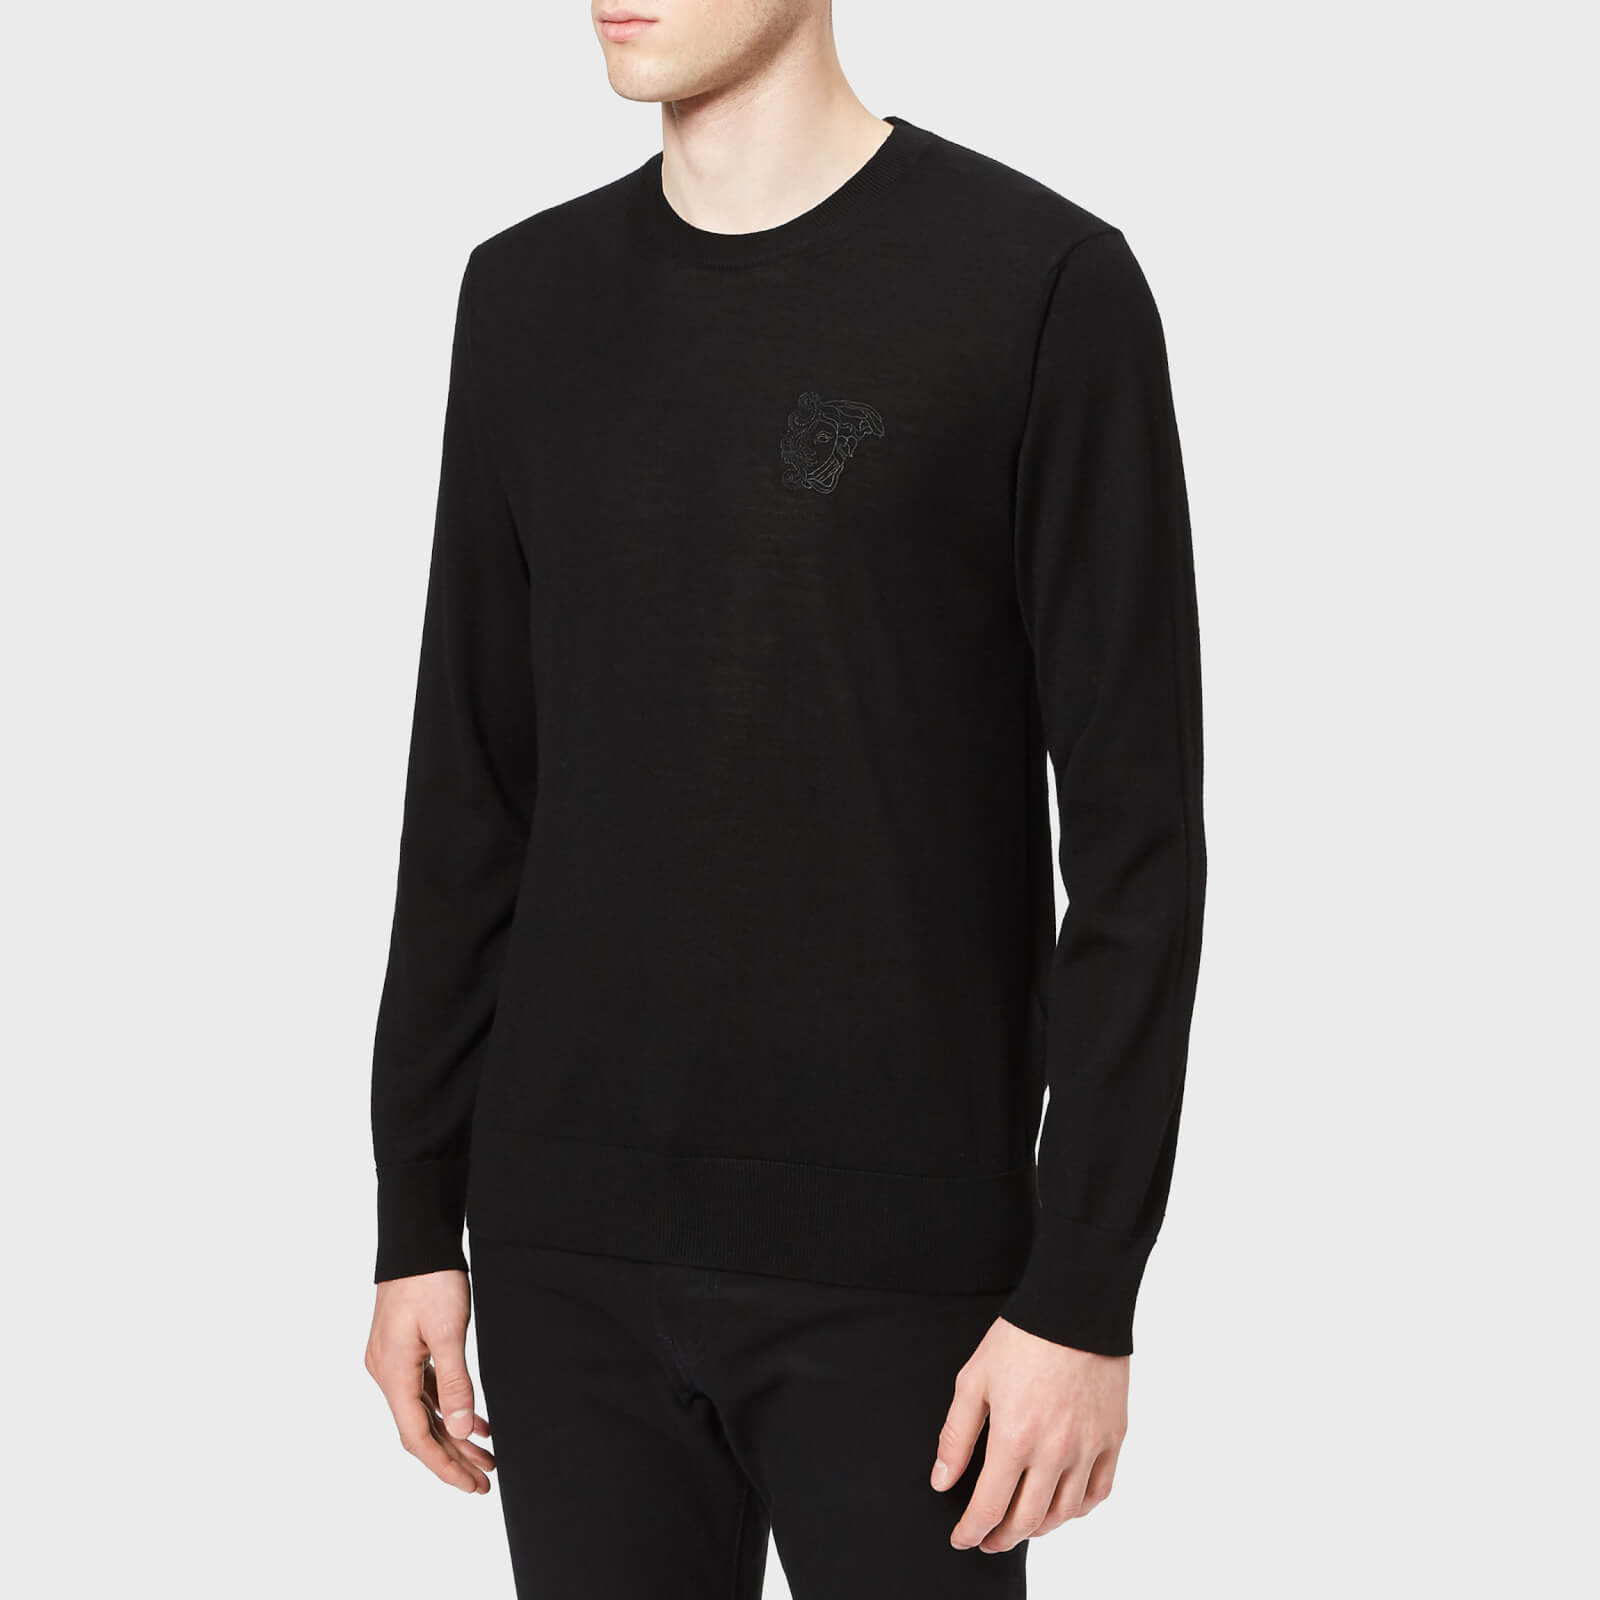 6e98a28e4aa Versace Collection Men's Crew Neck Knit Jumper - Nero